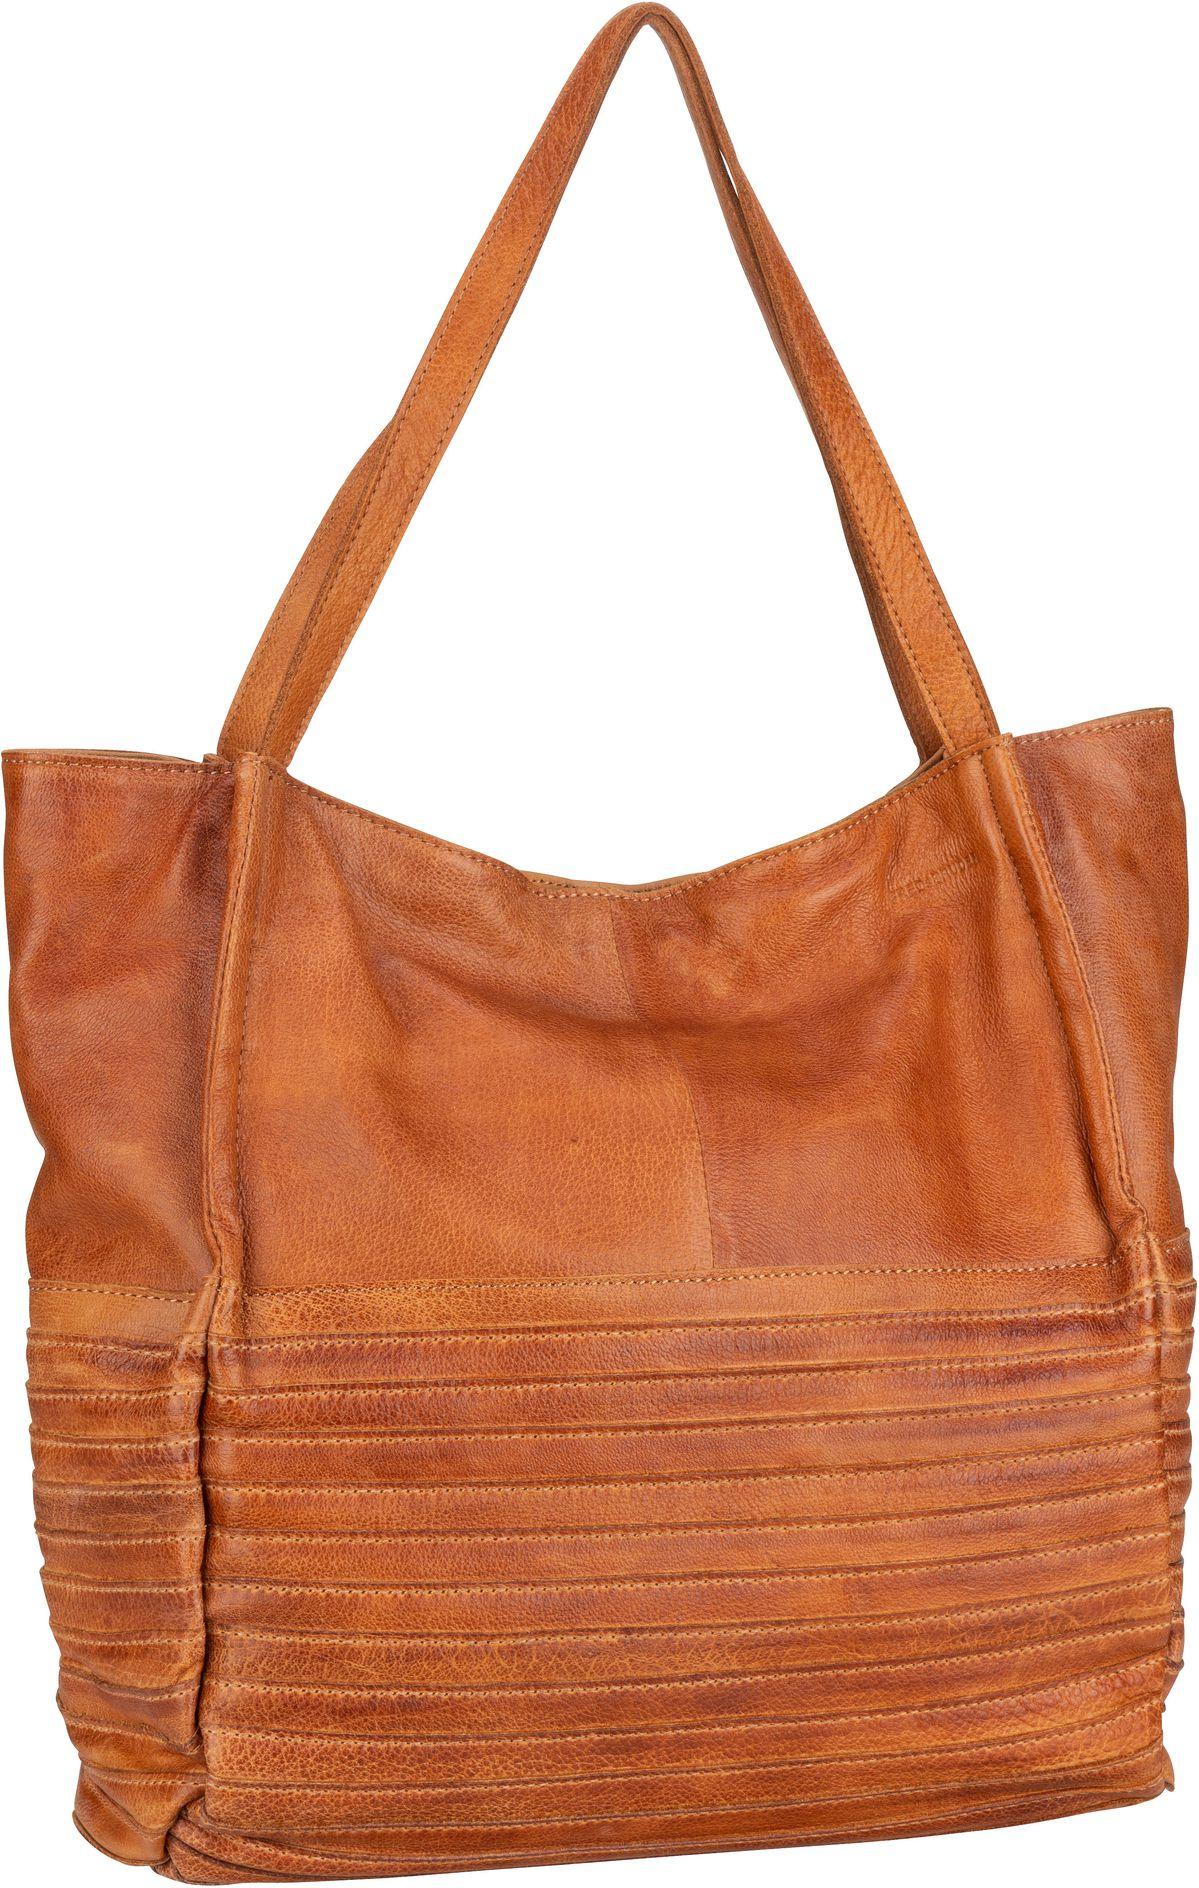 Handtasche Mob Caramel